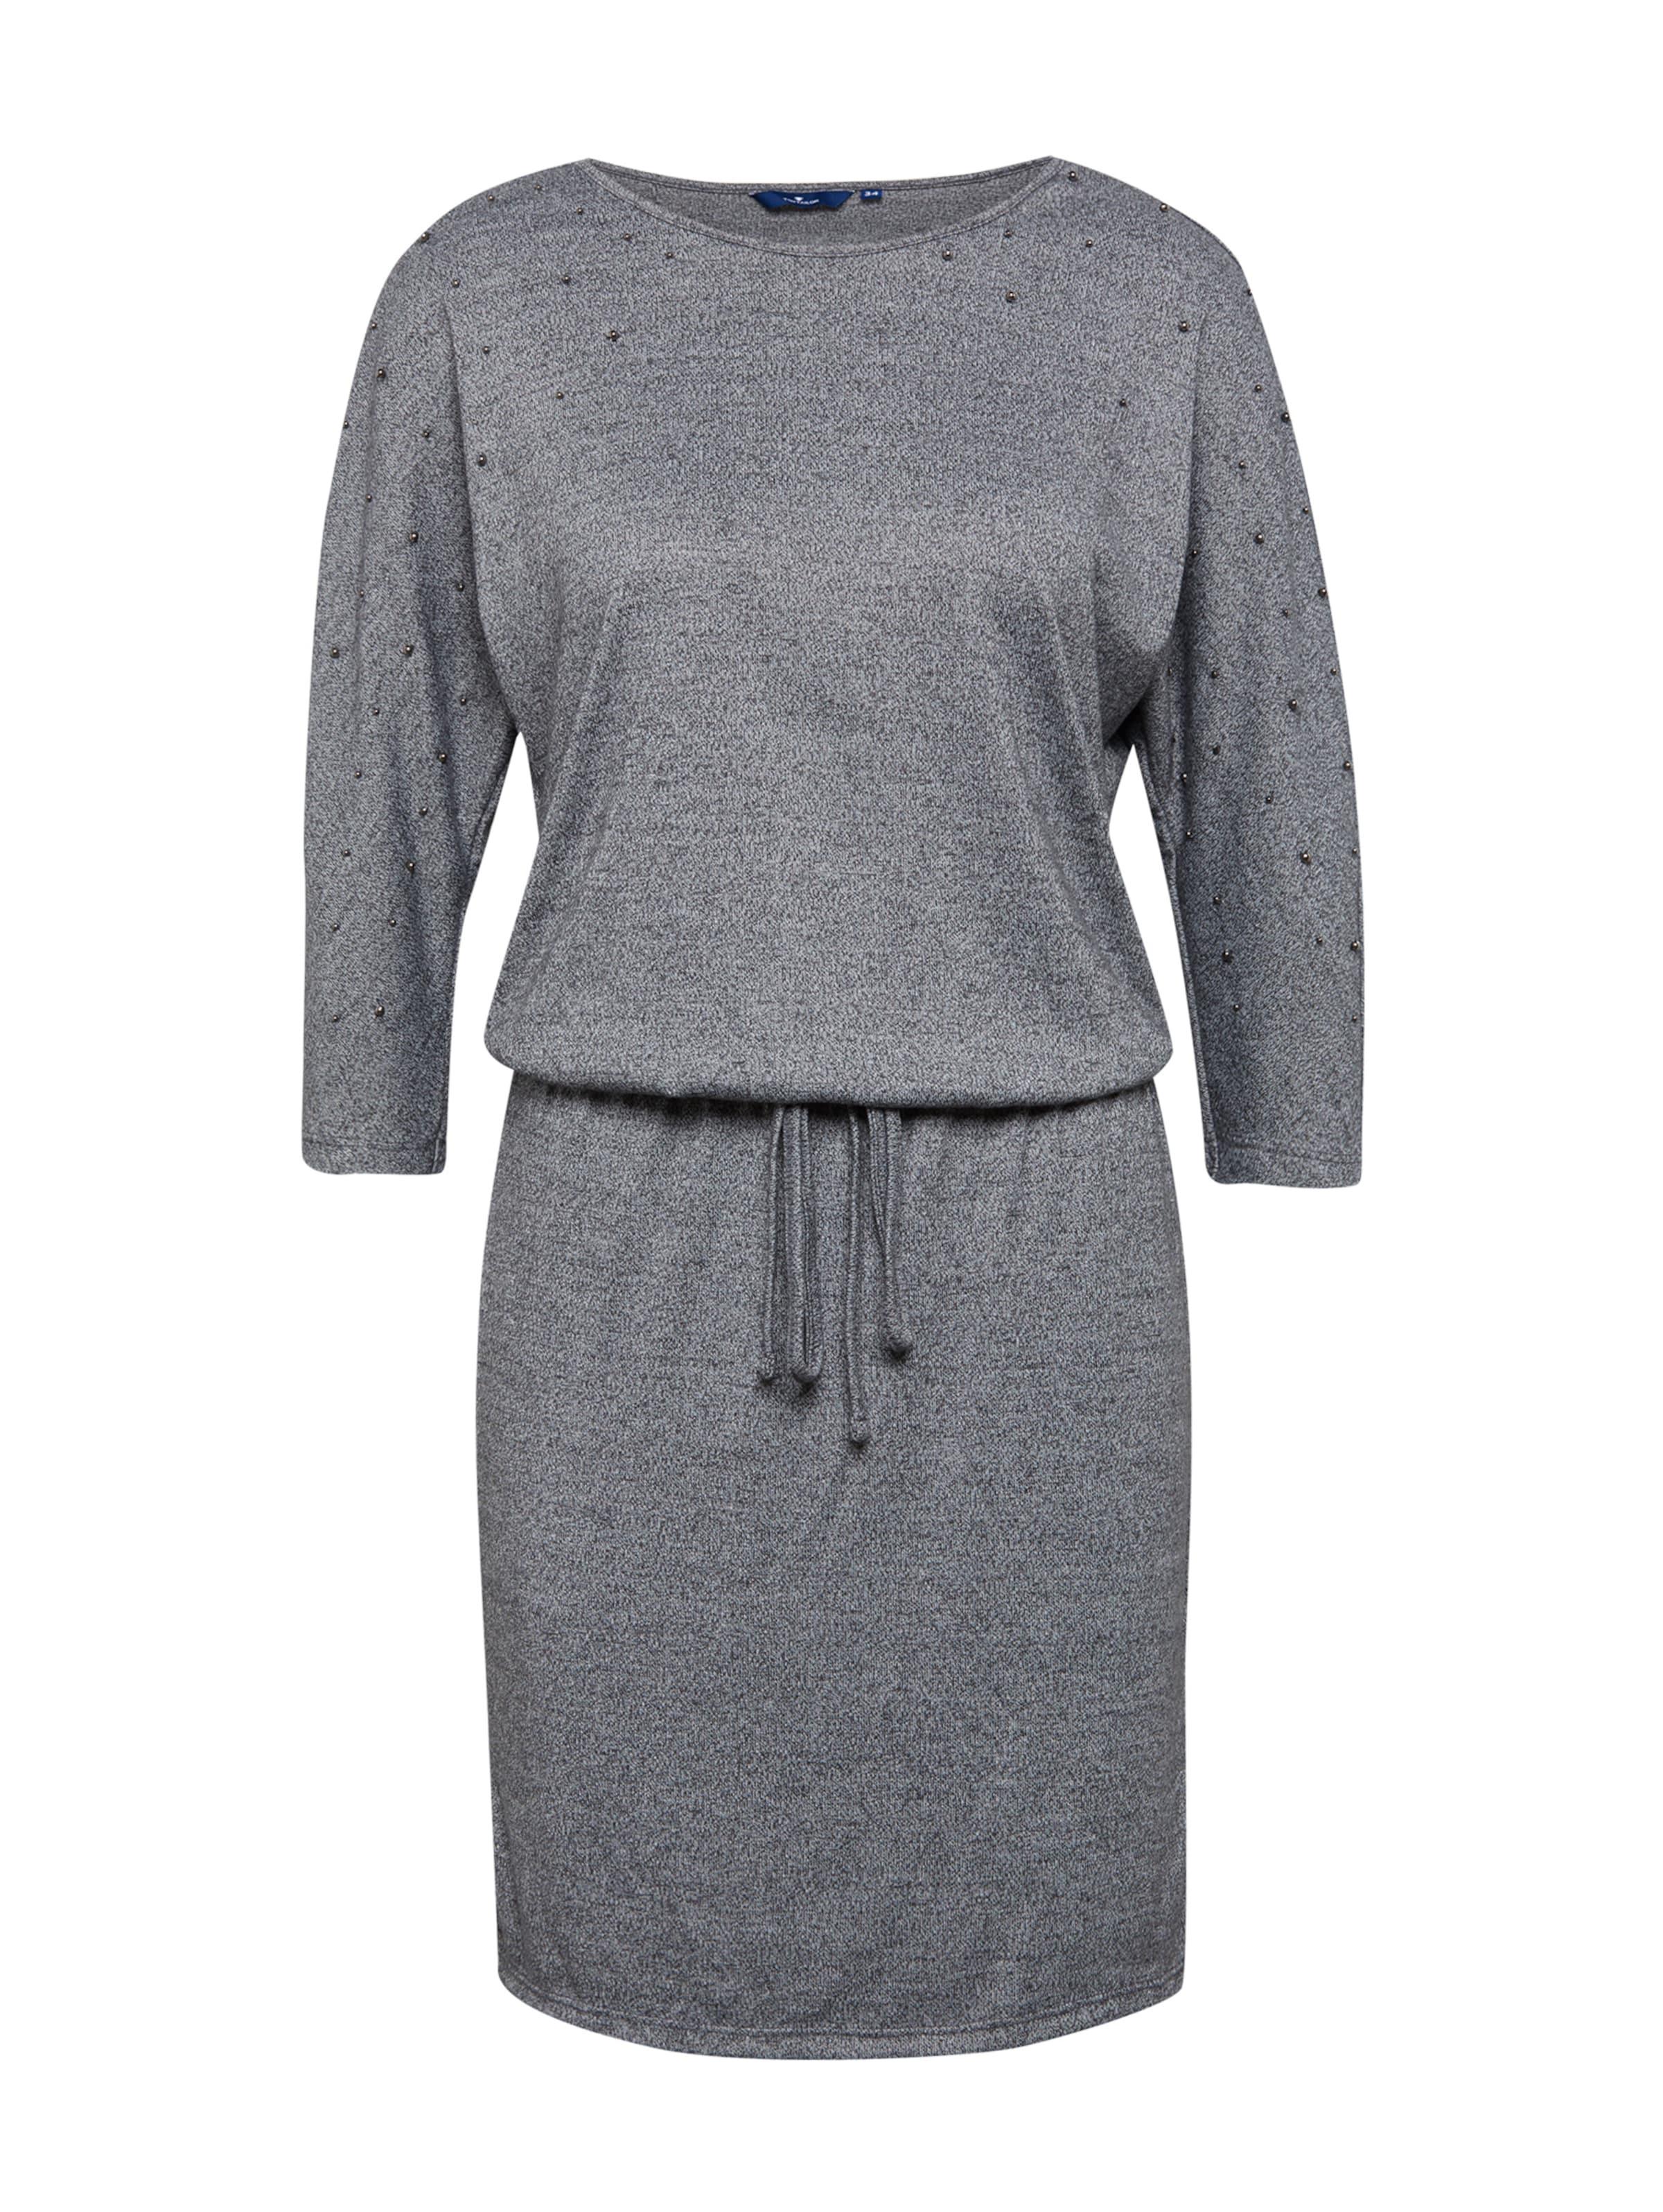 Tailor In Graumeliert Kleid In In Tom Tailor Tom Kleid Graumeliert Tom Tailor Kleid CrdxtshQB